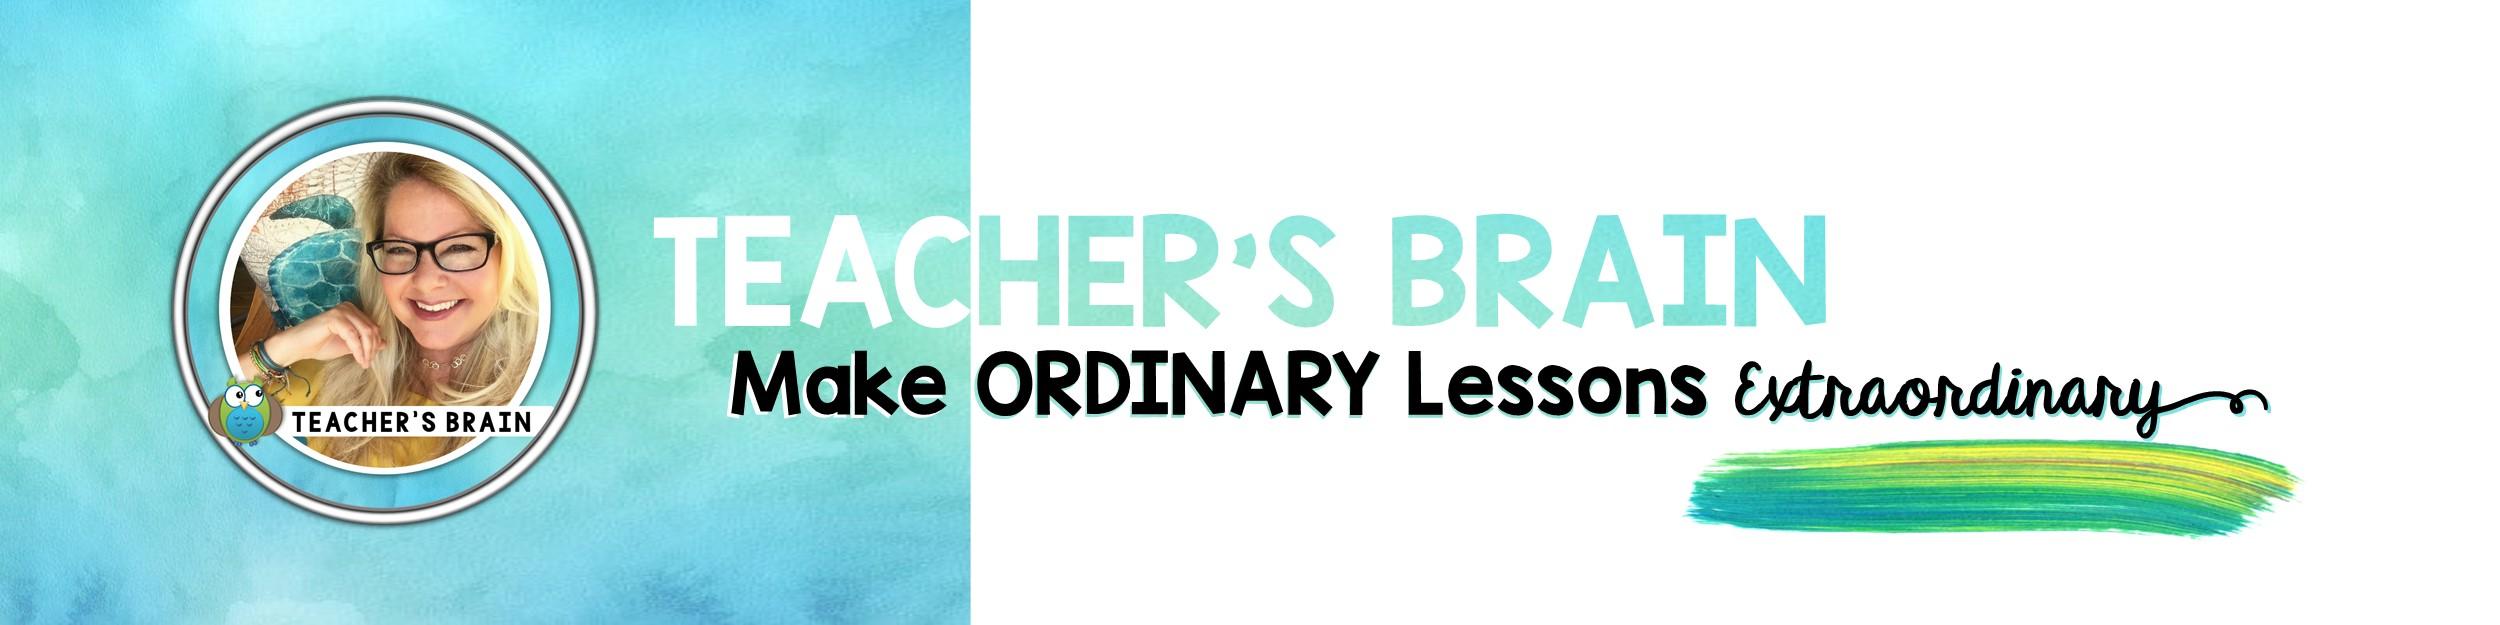 Teacher's Brain Blog